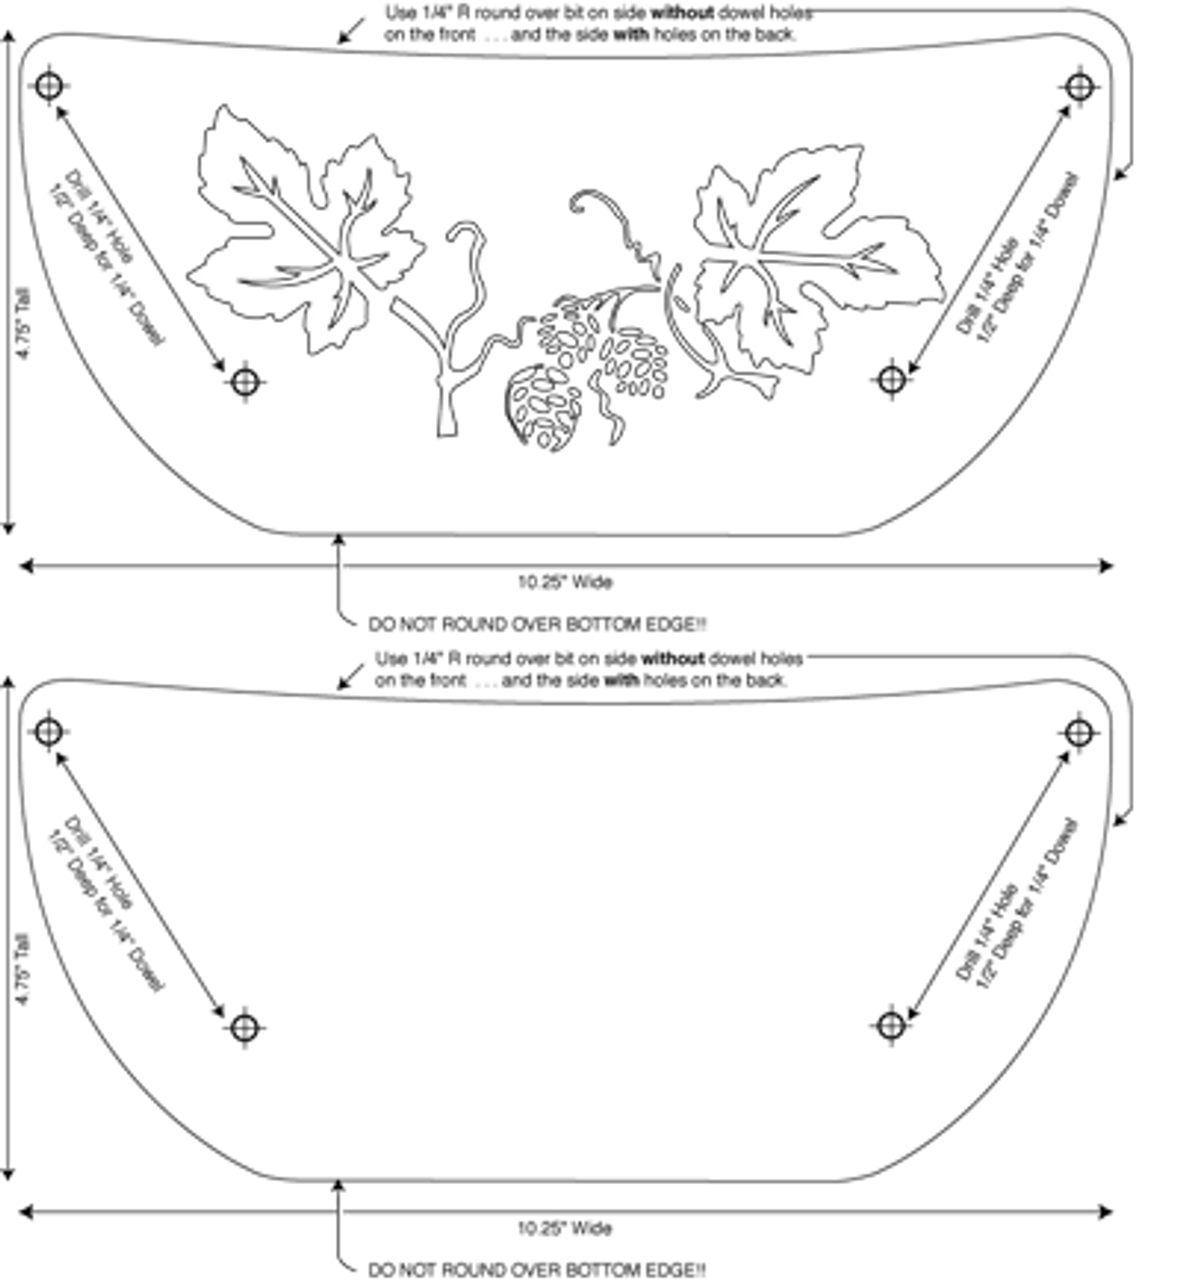 Leaf Plate Holder scroll saw pattern